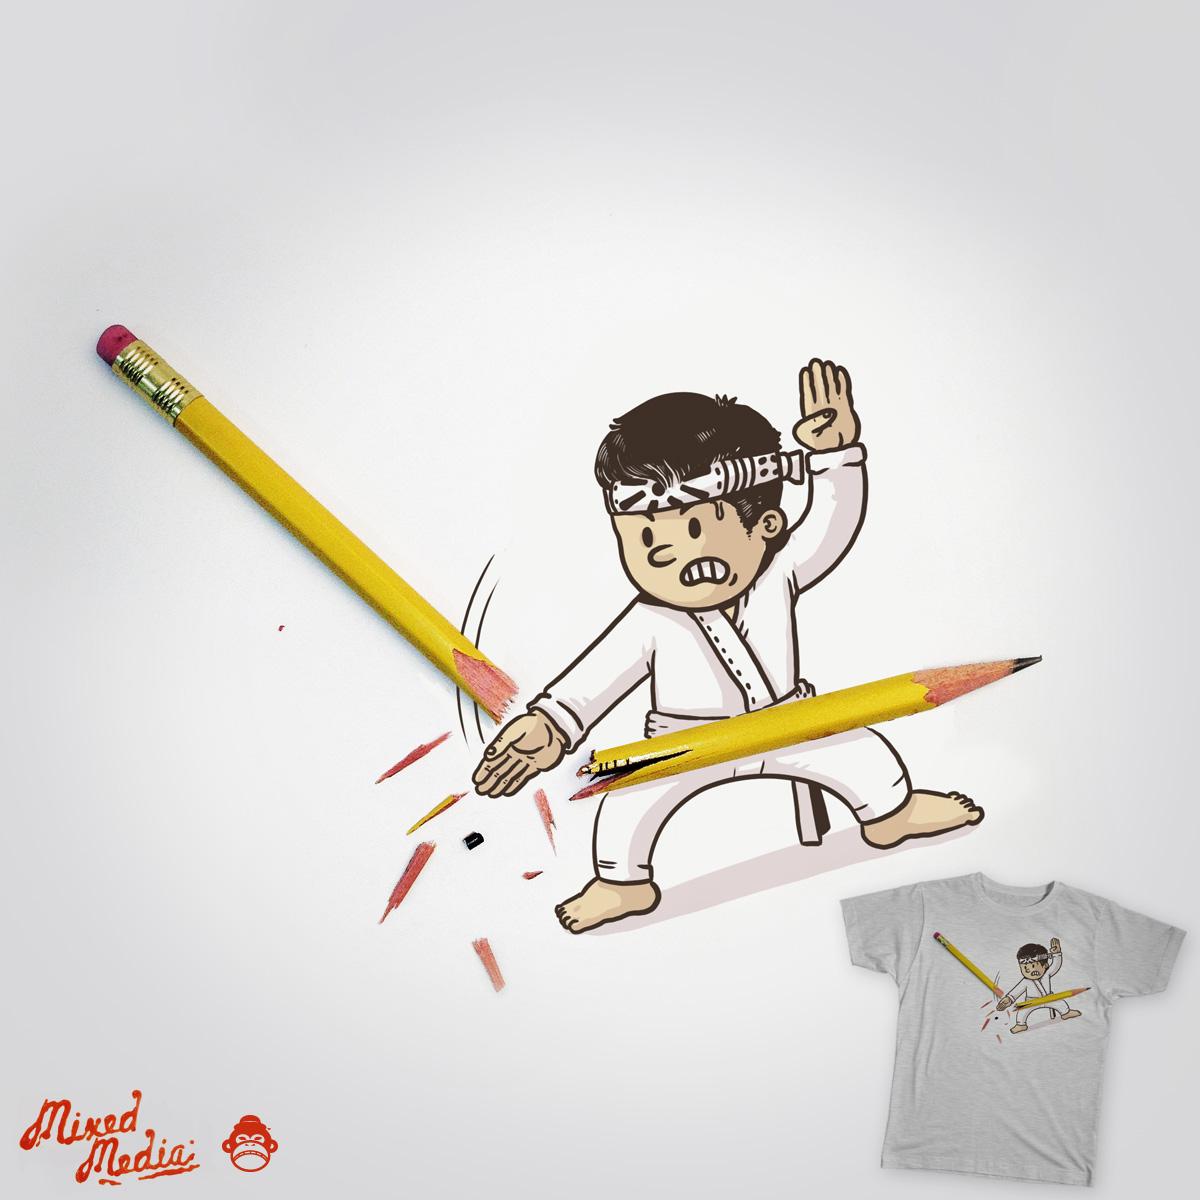 Karate Chop by alexmdc on Threadless